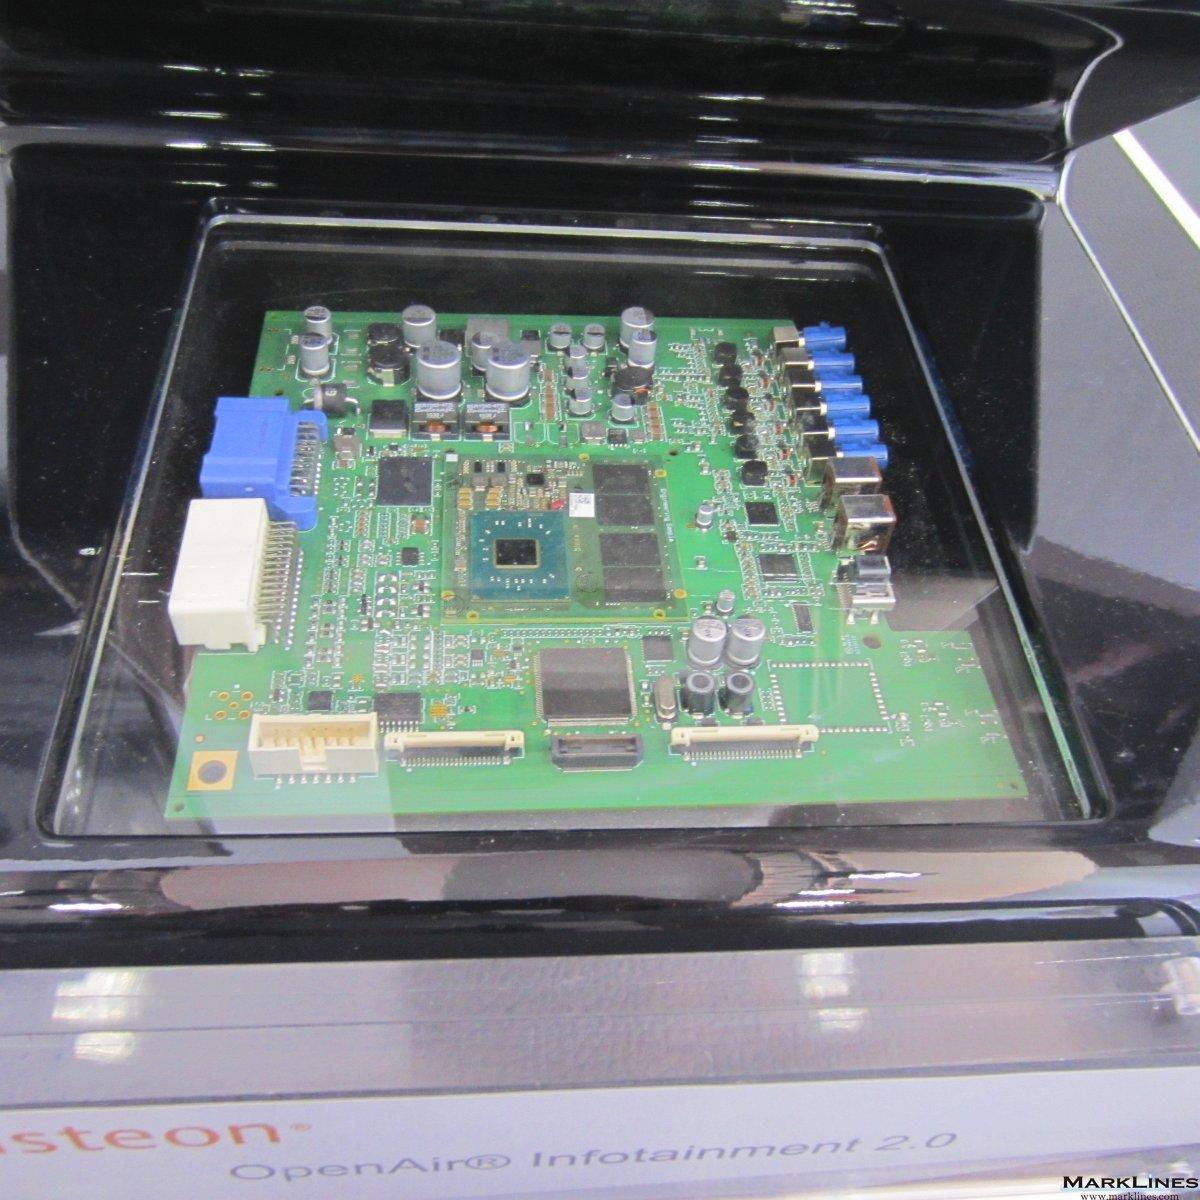 Visteon Corporation Marklines Automotive Industry Portal Inverter Air Conditioner Renesas Electronics India Logo